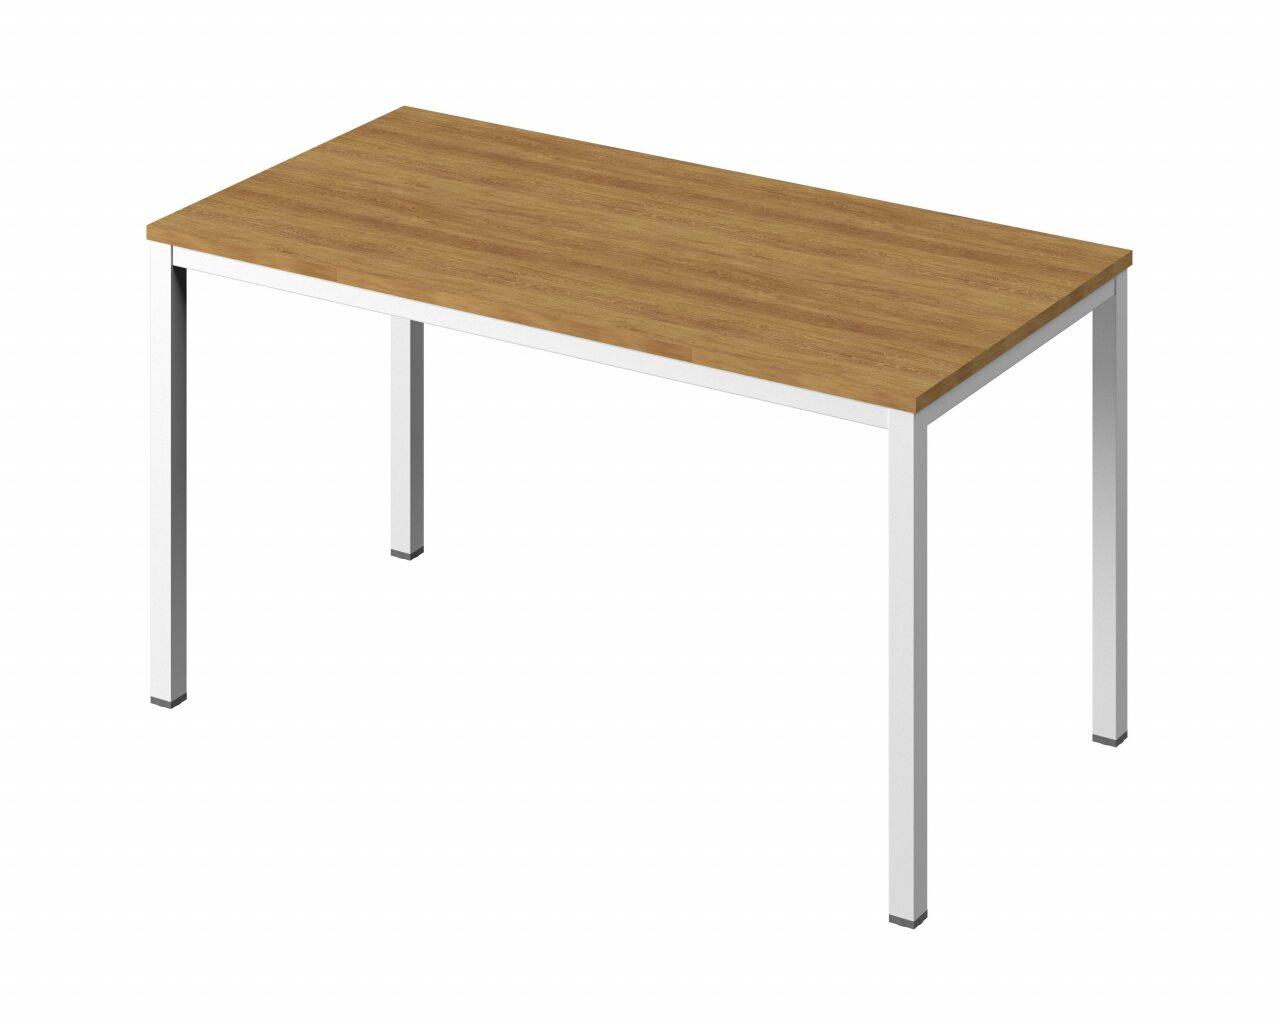 Стол на металлокаркасе без заглушек кабель-канала  Public Comfort 135x70x74 - фото 4